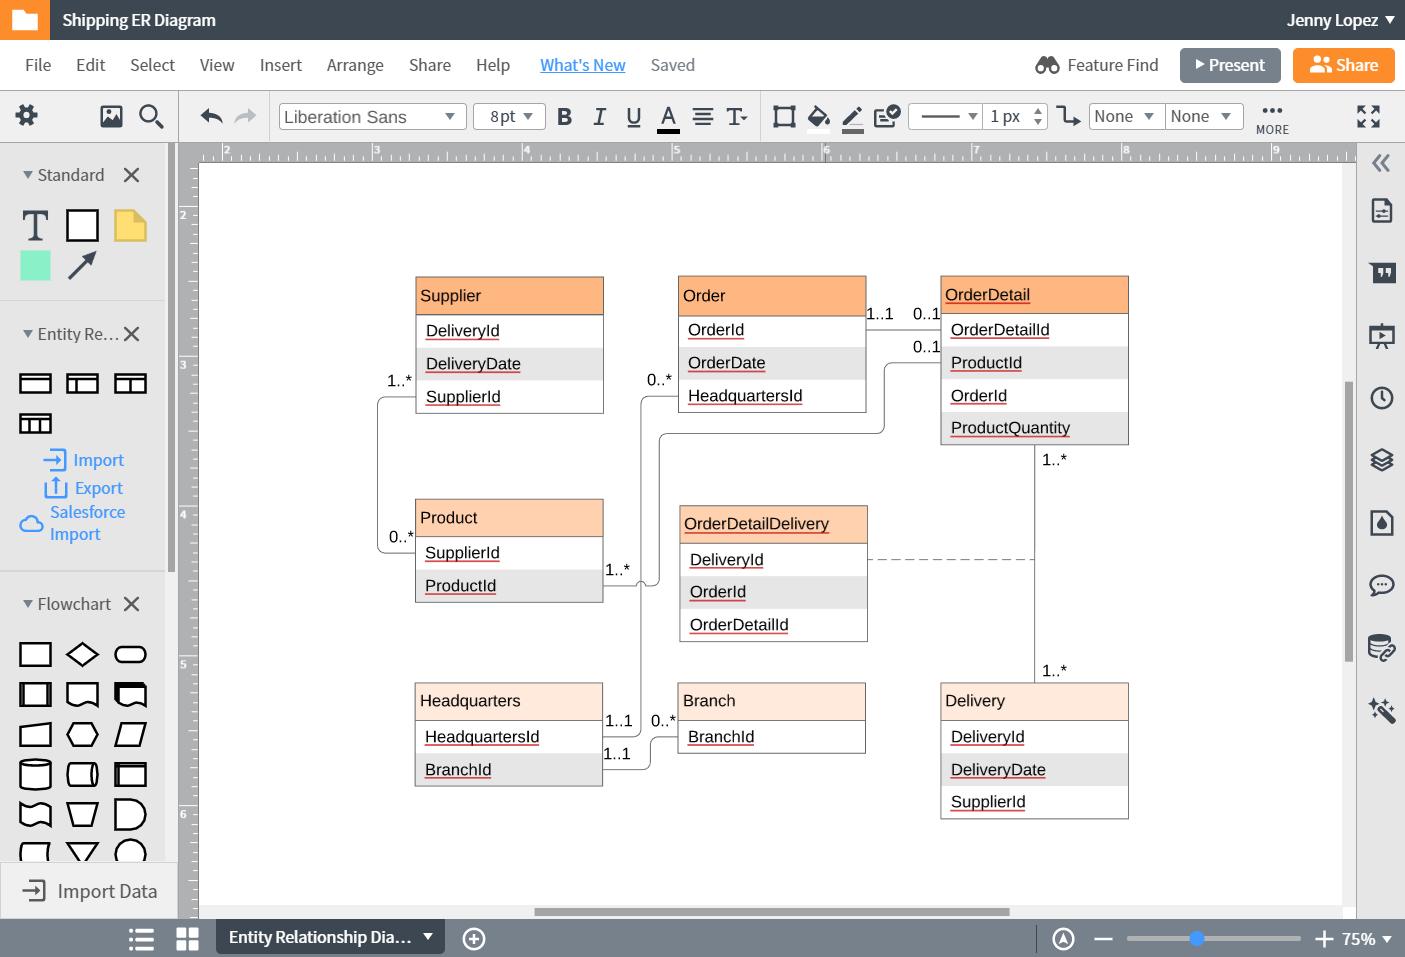 Er Diagram (Erd) Tool | Lucidchart pertaining to Draw Erd Diagram